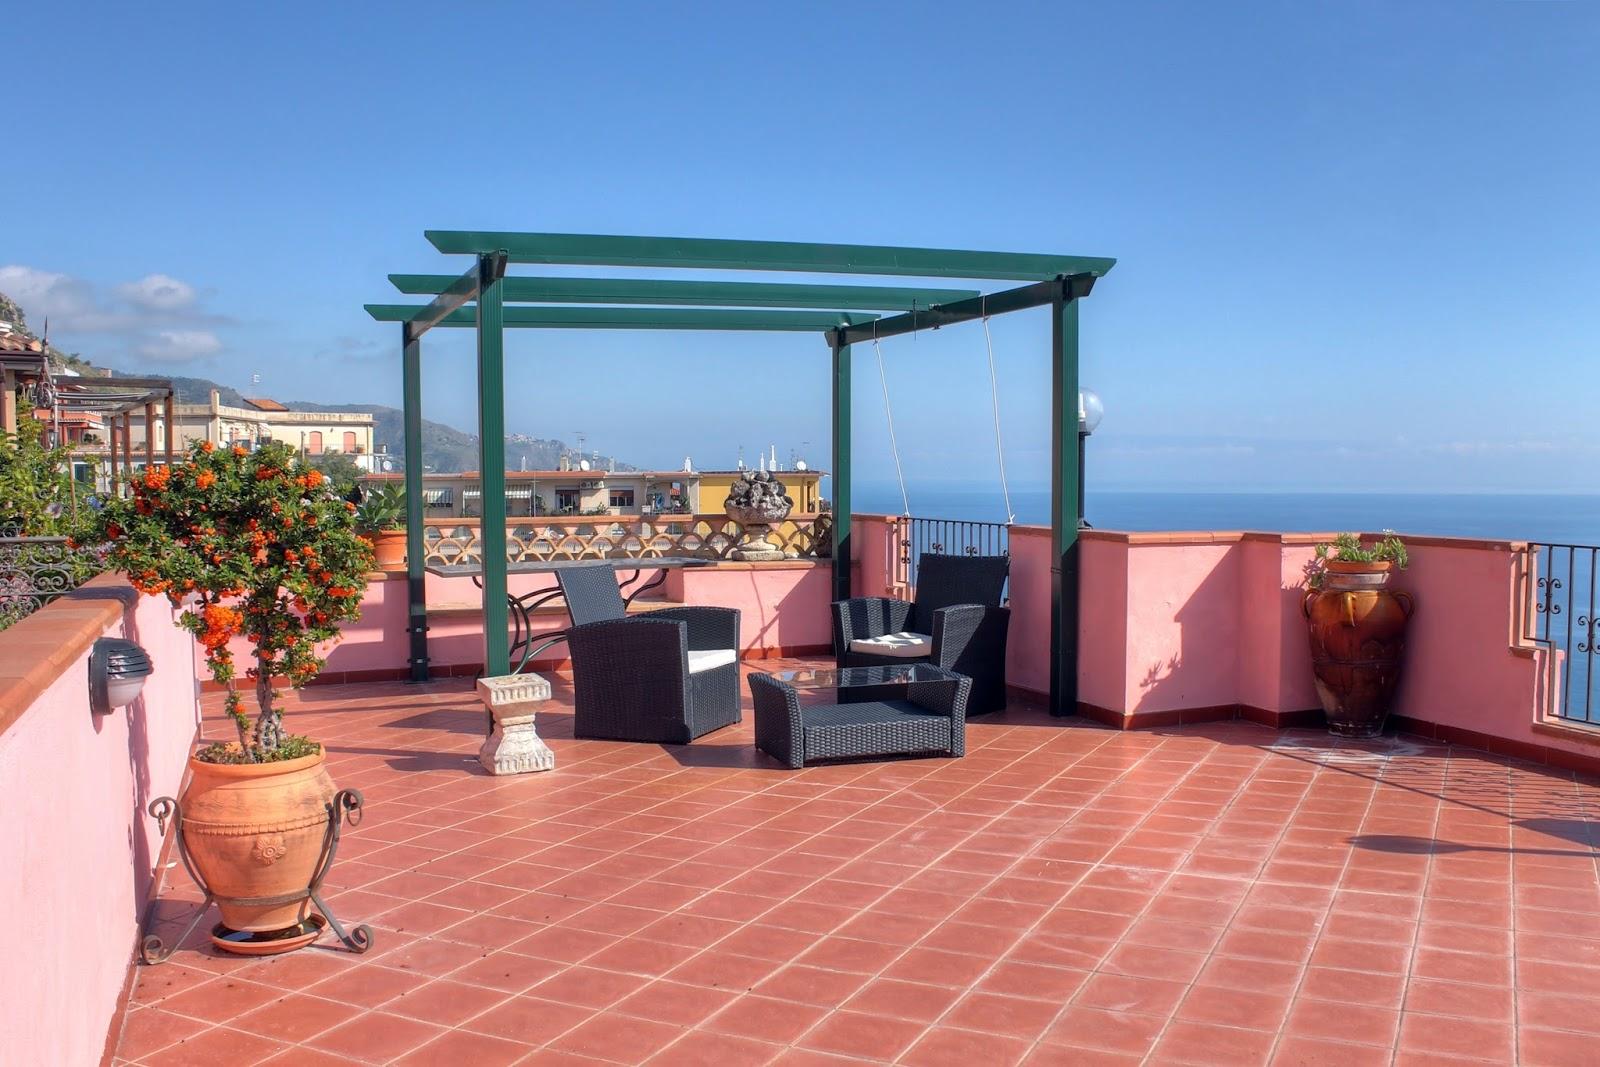 Beautiful Le Terrazze Santa Teresa Di Riva Gallery - Design and ...